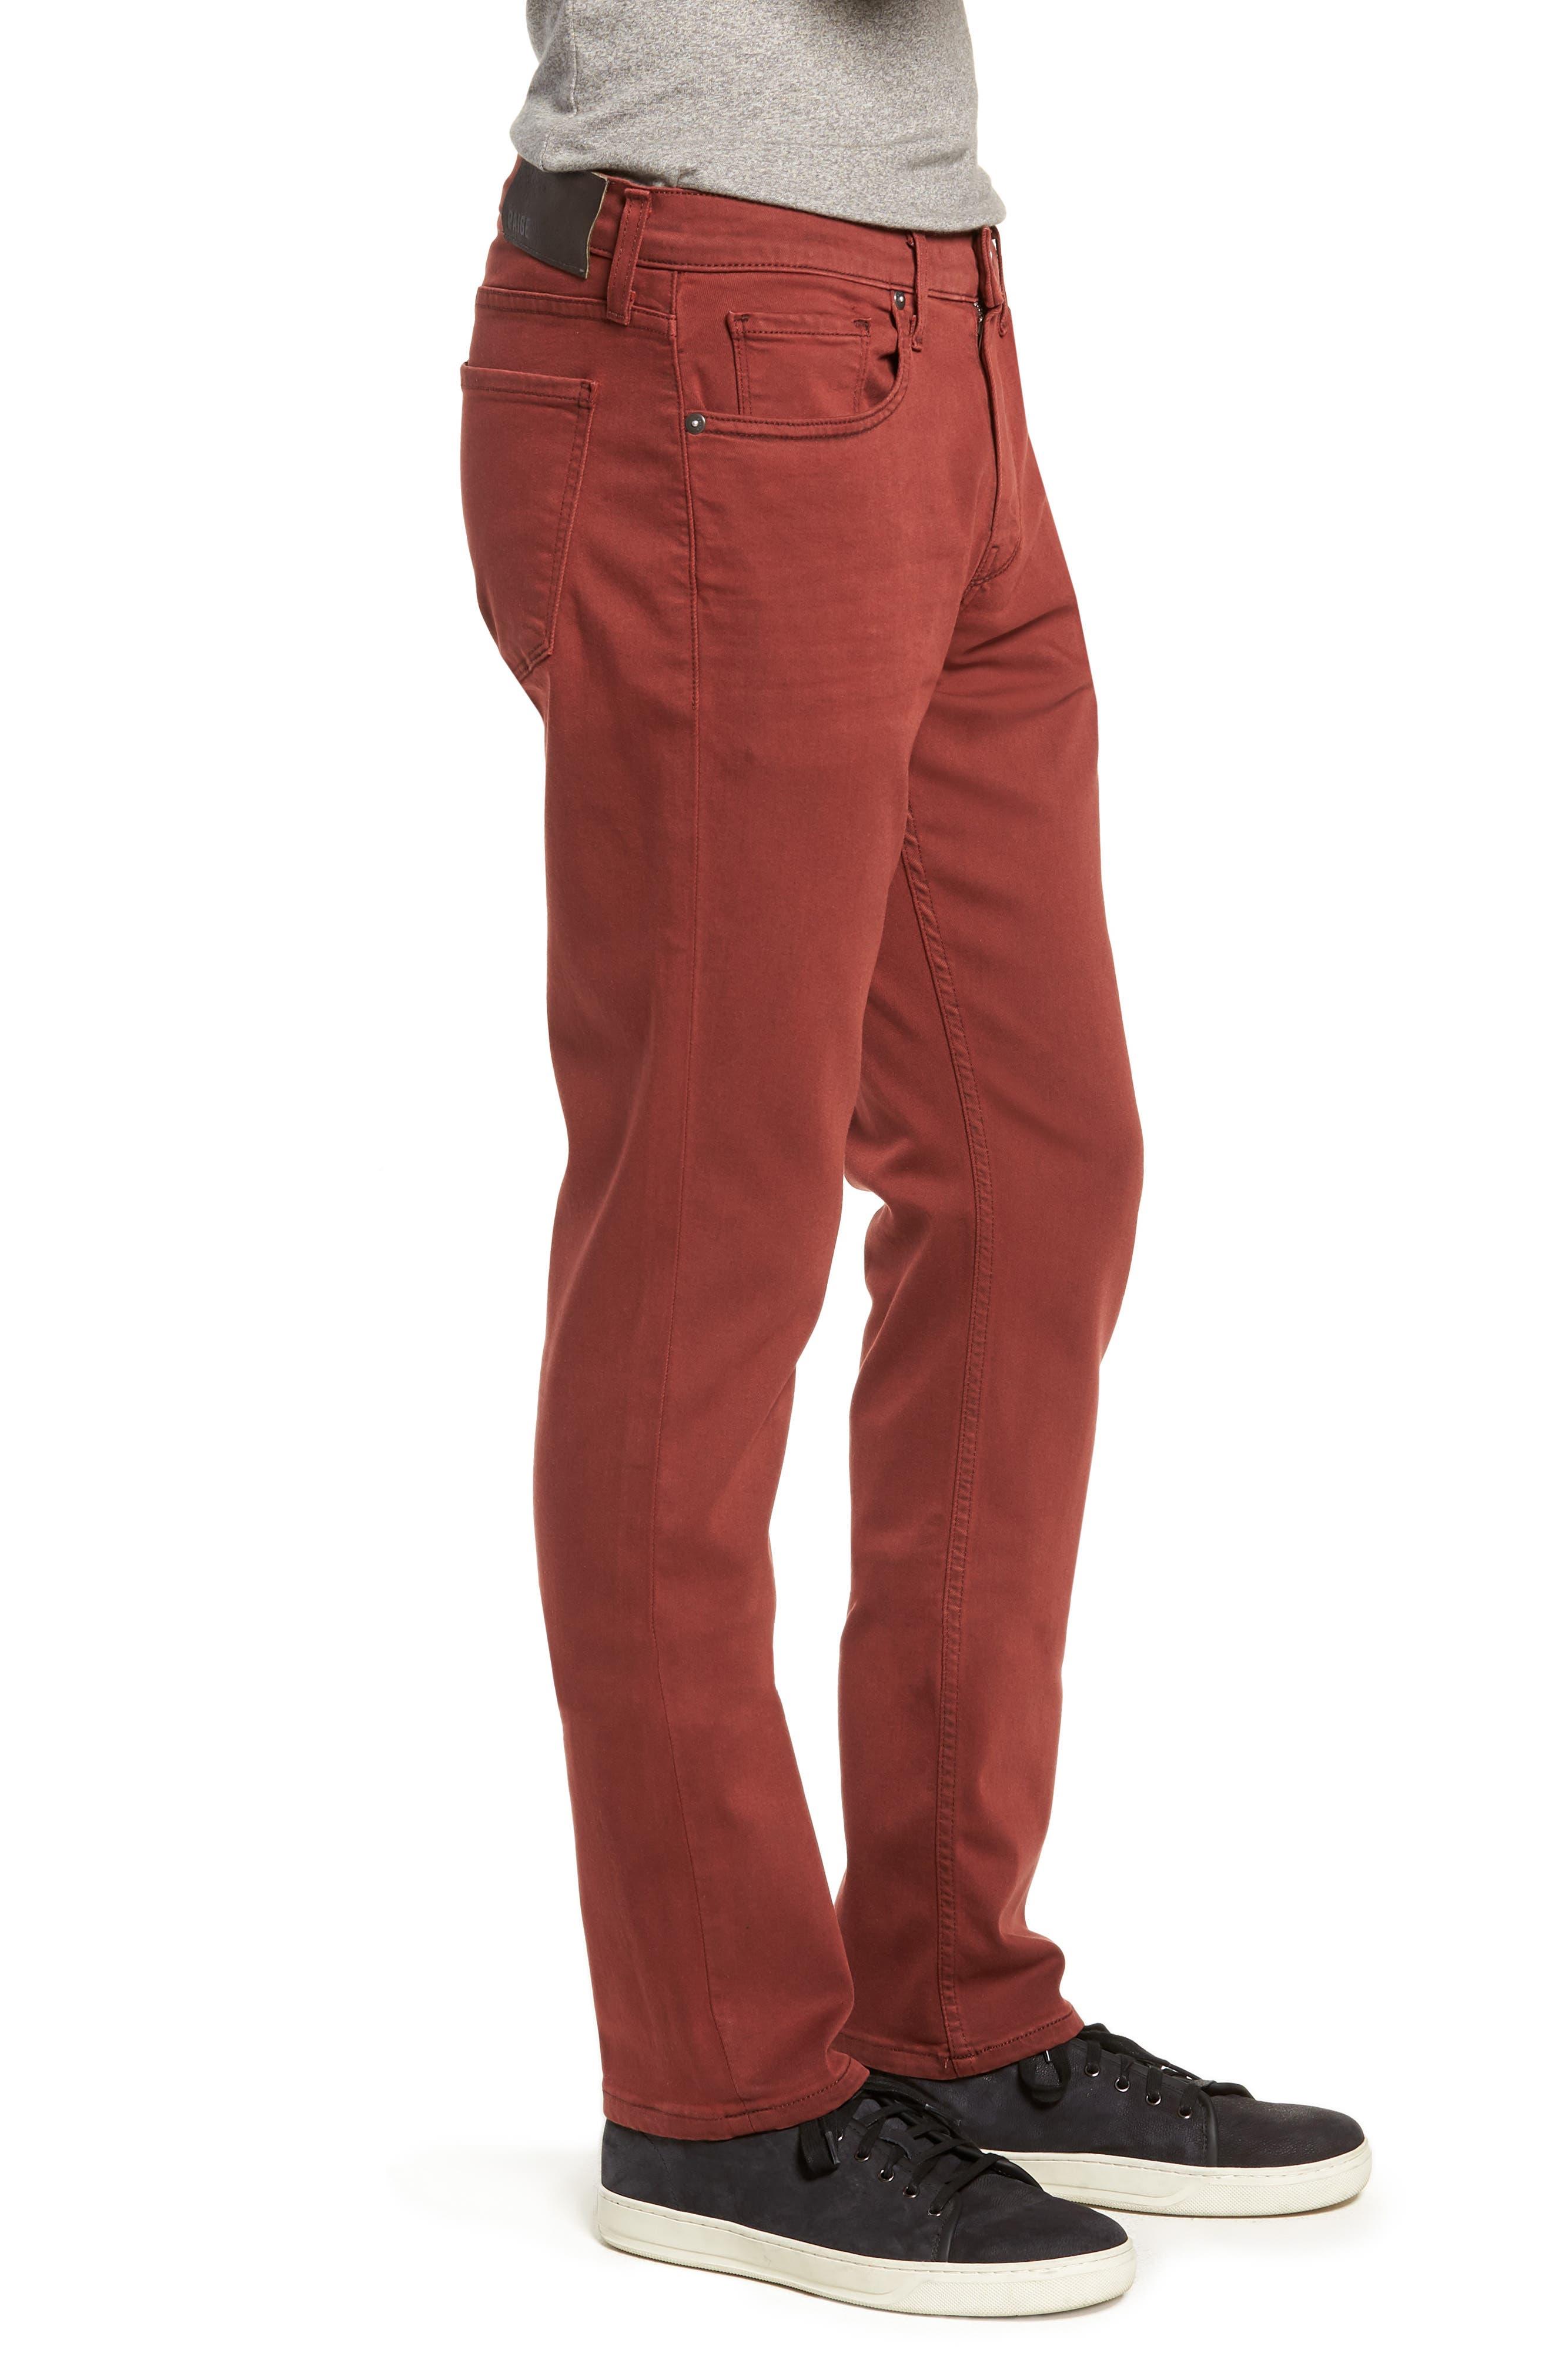 Transcend - Federal Slim Straight Leg Jeans,                             Alternate thumbnail 3, color,                             VINTAGE PERSIMMON